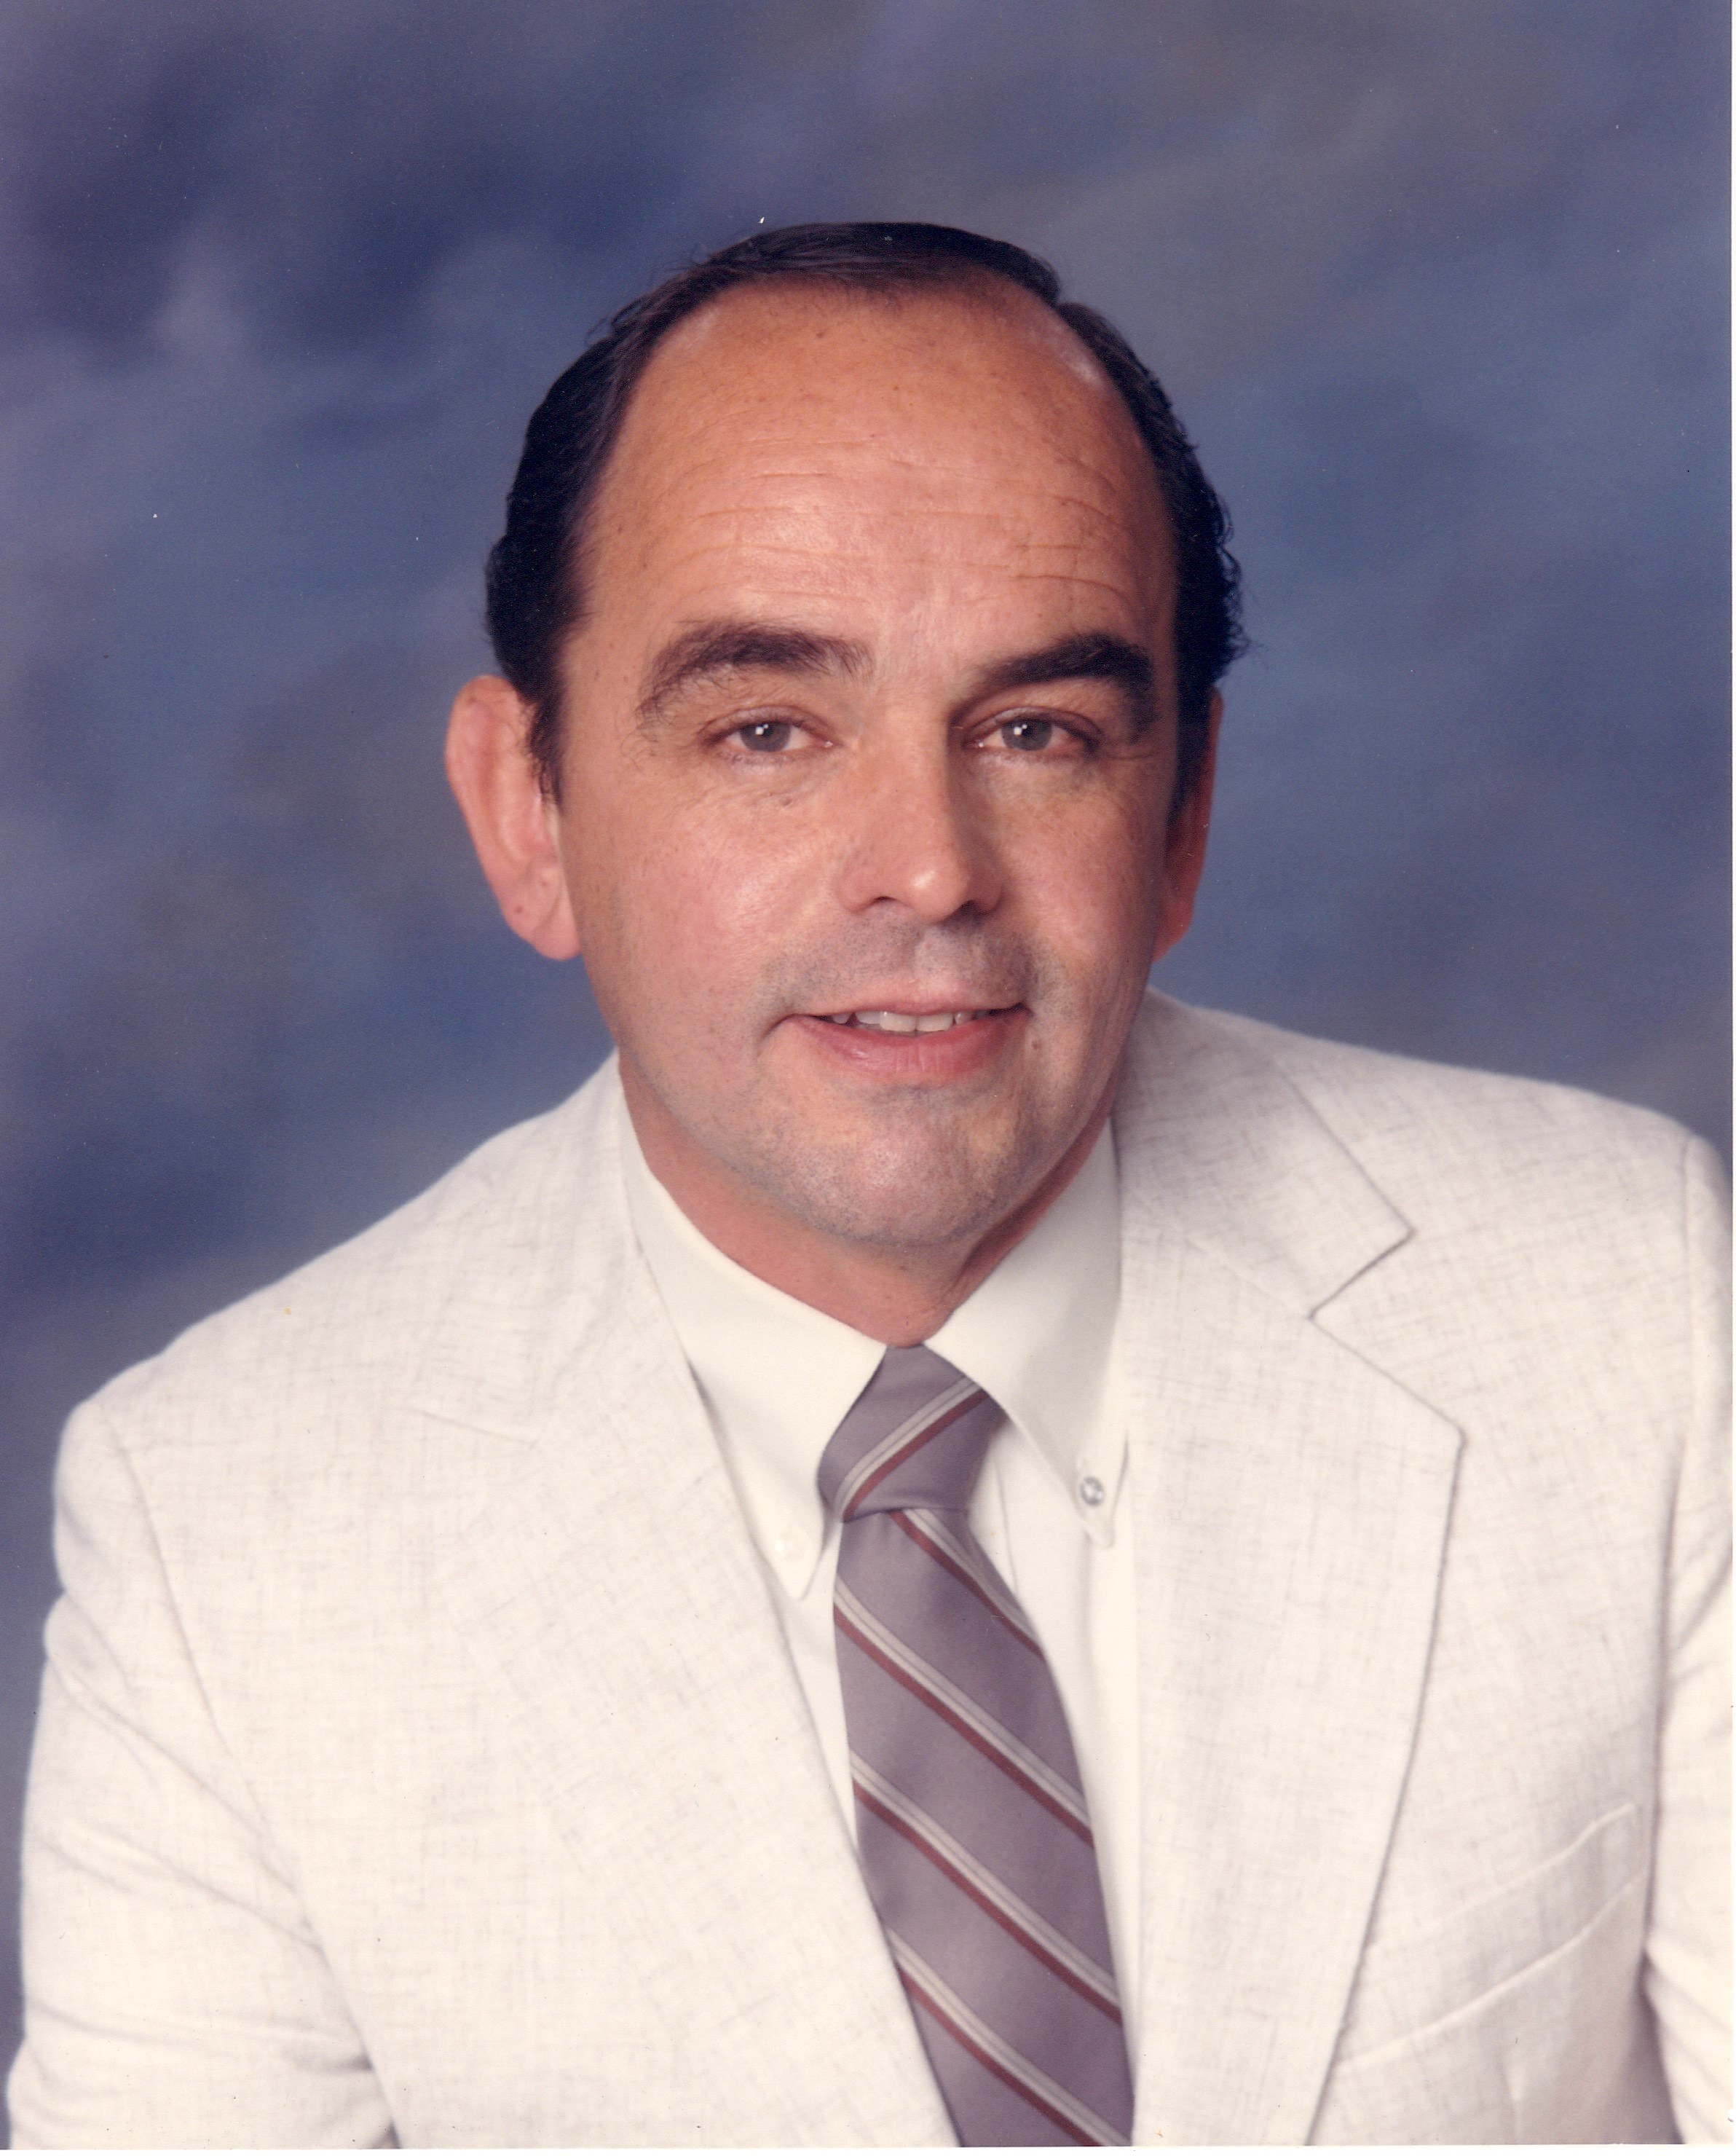 John J. Georger